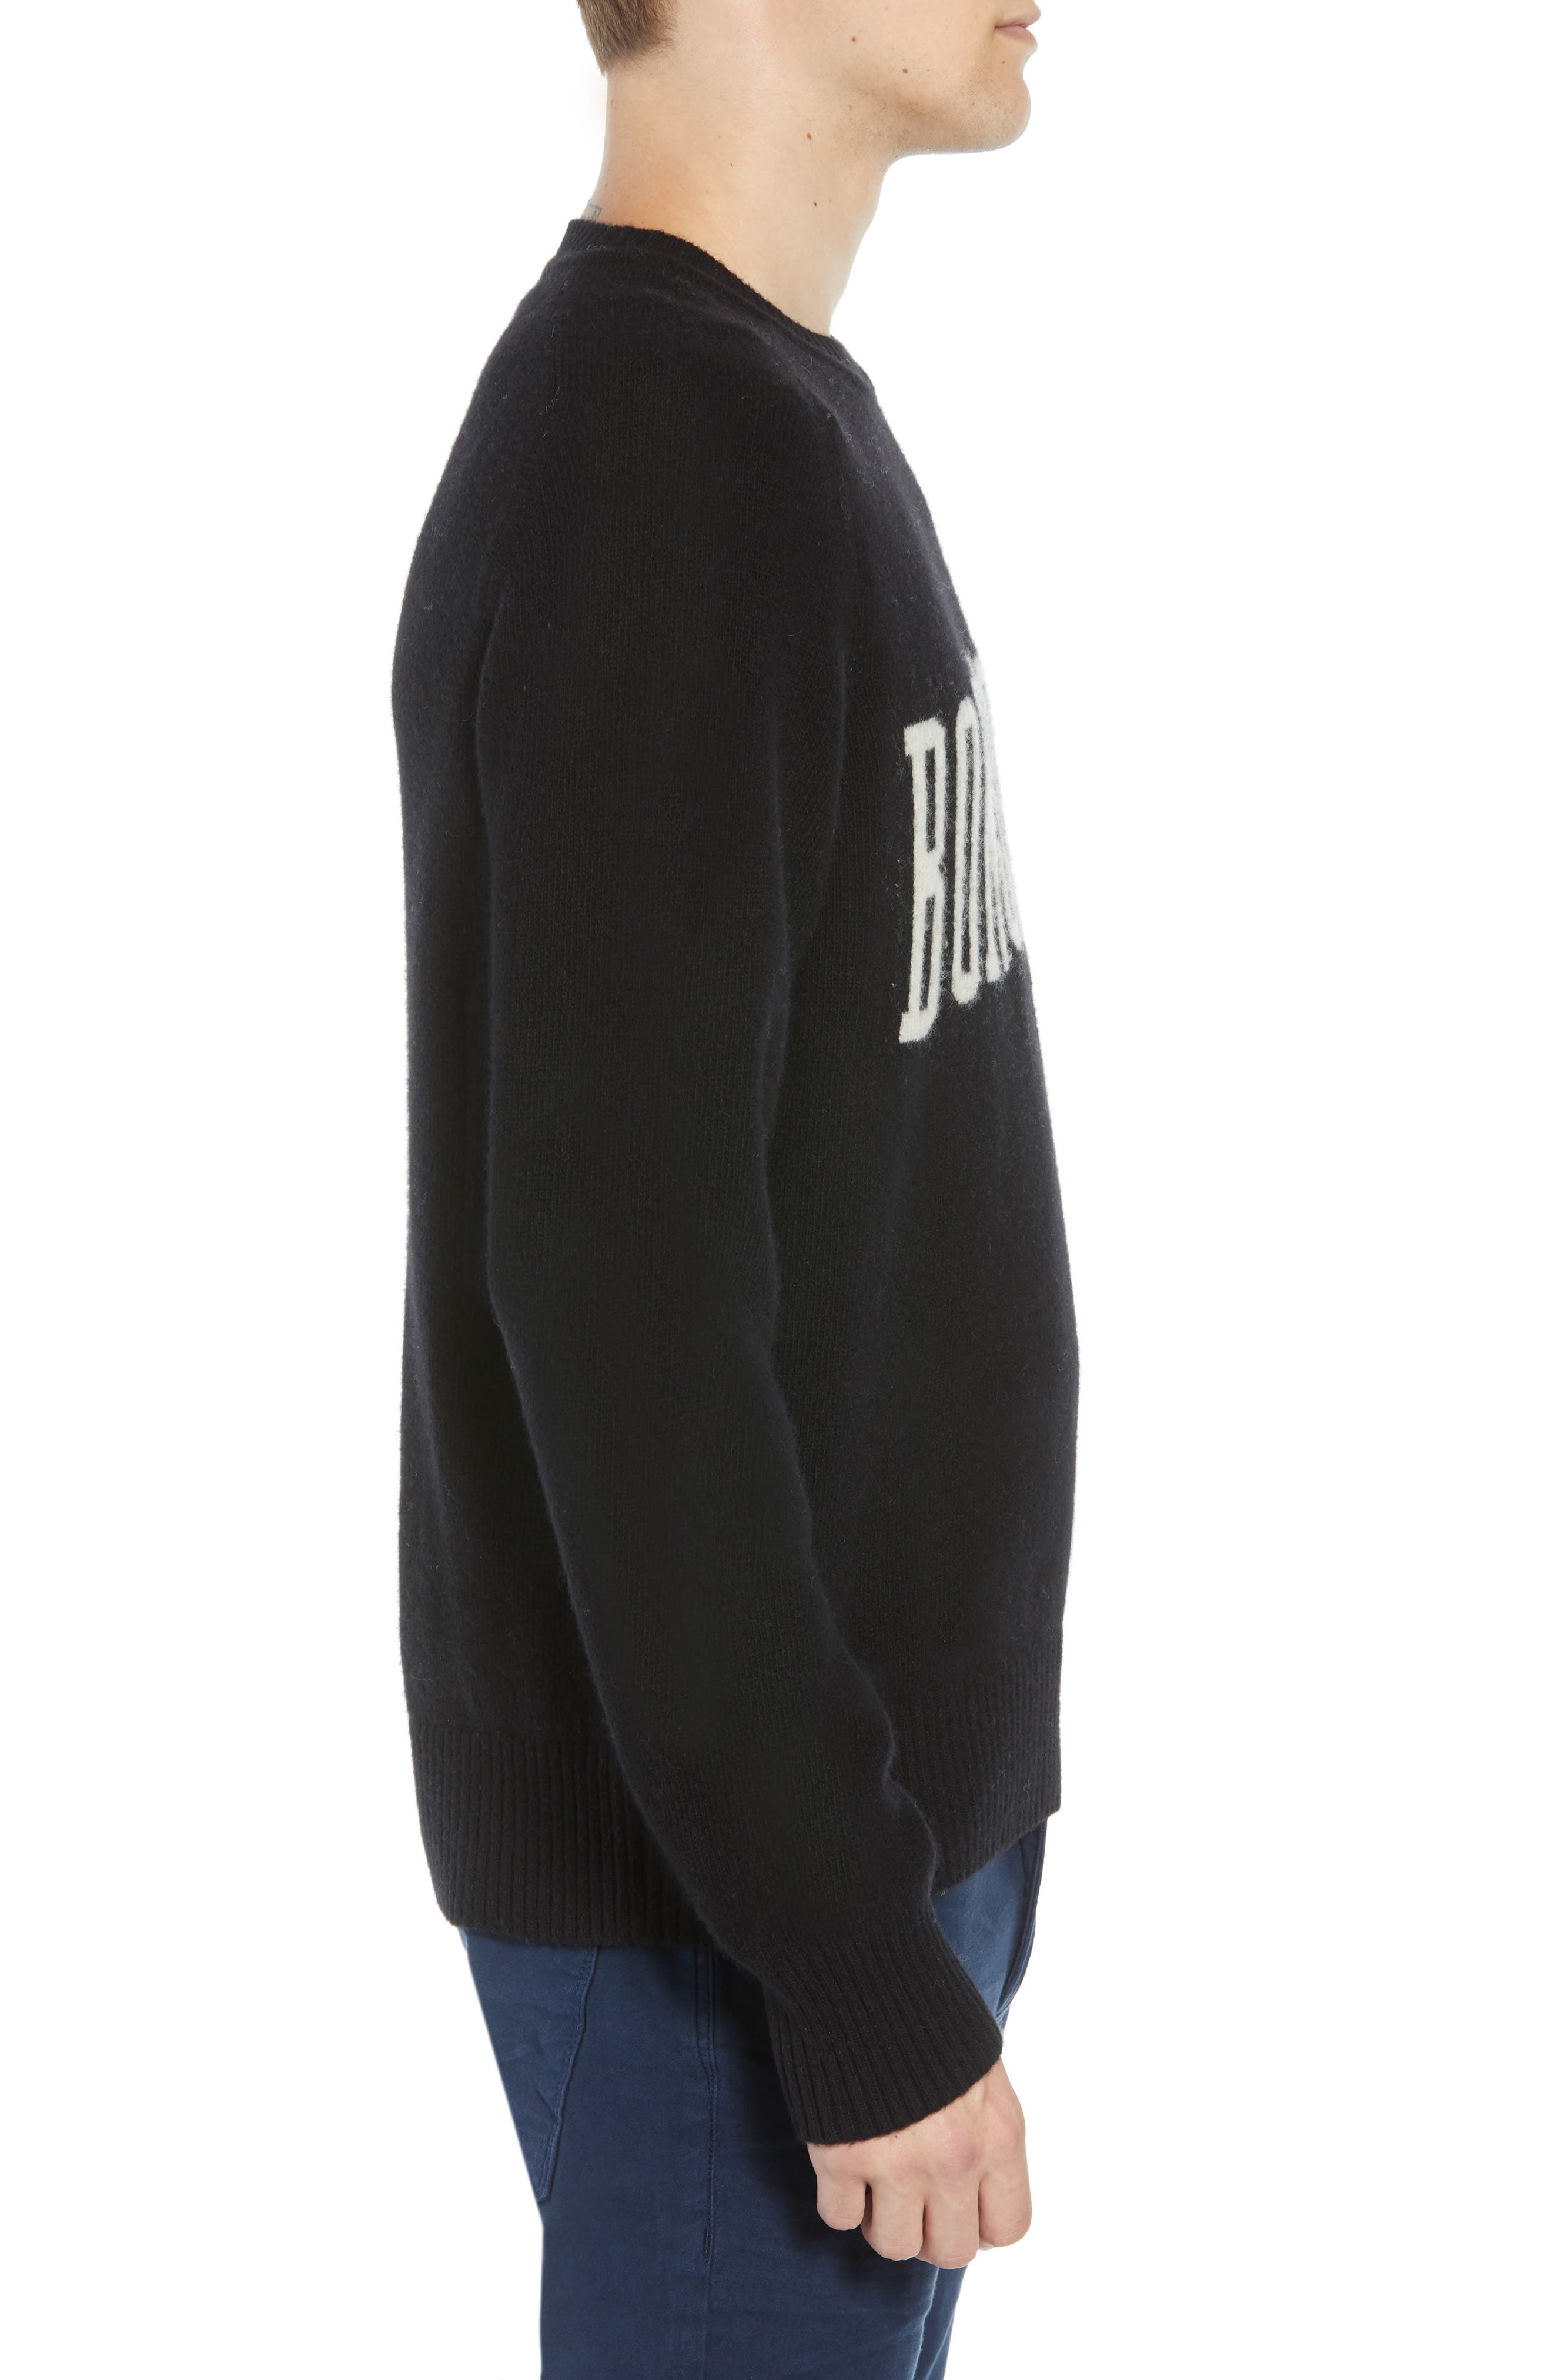 Bonjour Wool Blend Sweater,                             Alternate thumbnail 3, color,                             BLACK WHITECAP GREY